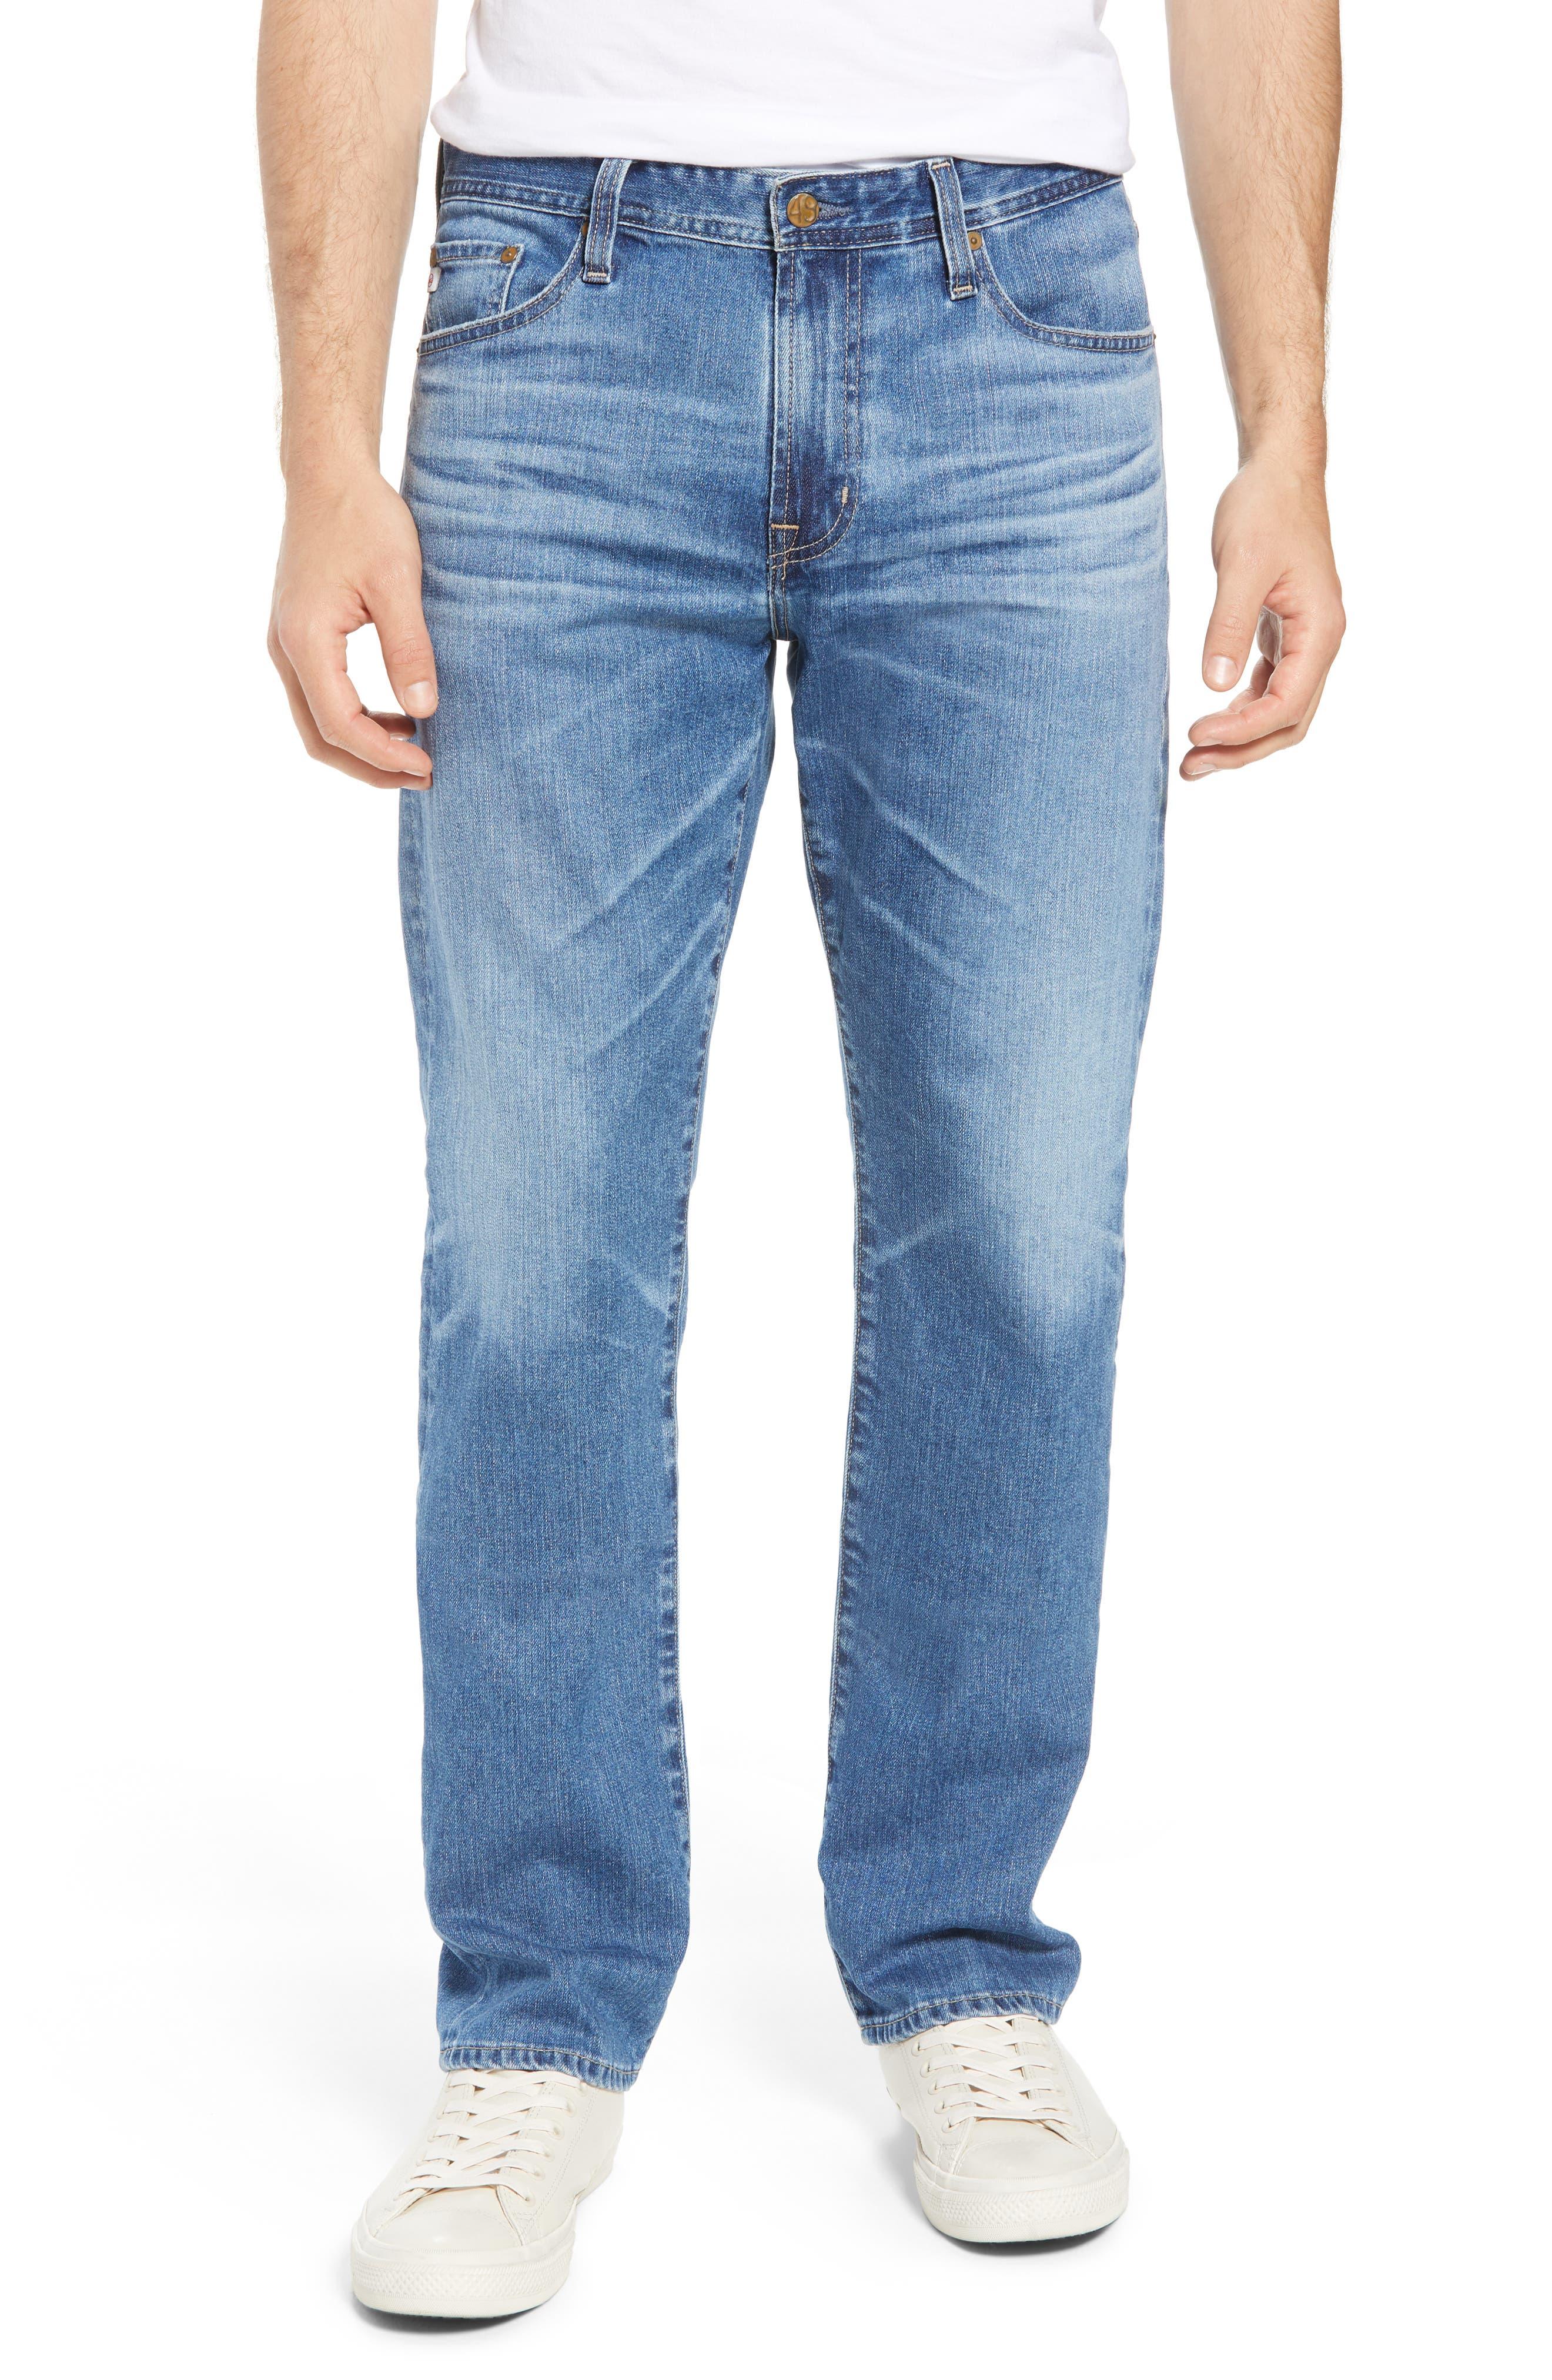 Everett Slim Straight Leg Jeans,                         Main,                         color, 15 Years Open Road